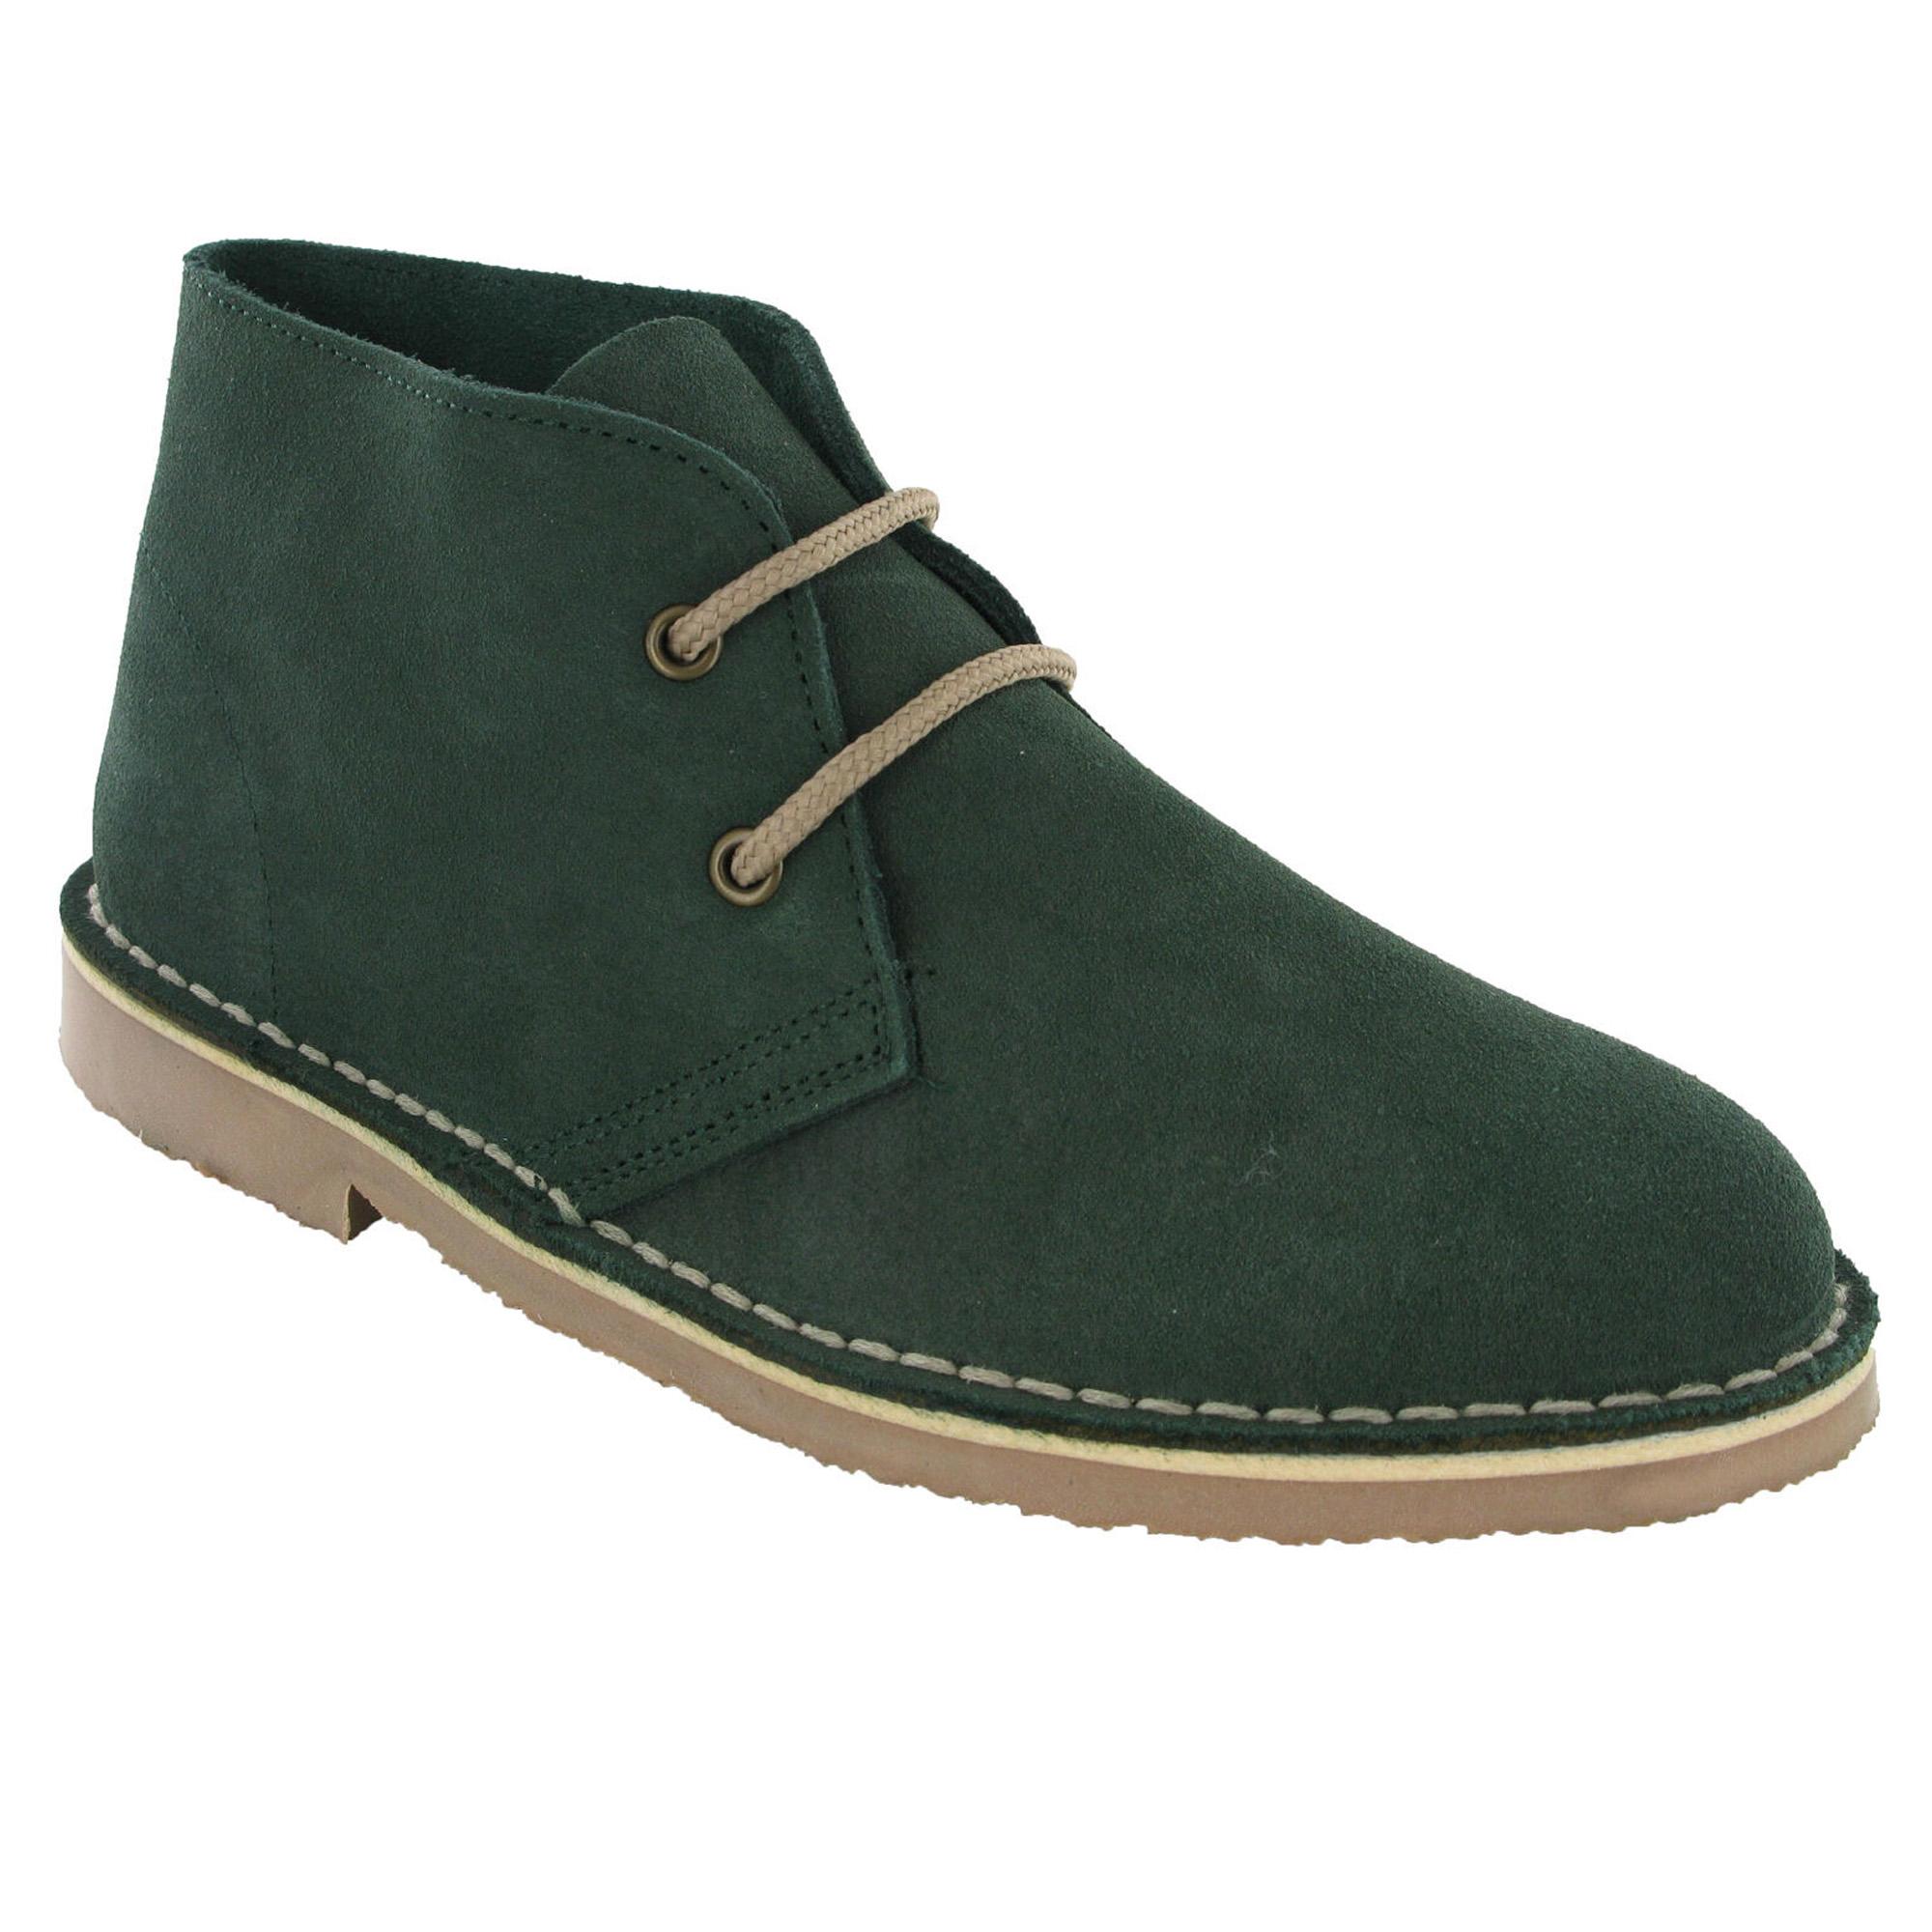 Roamers Womens/Ladies Real Suede Unlined Desert Boots (6 UK) (Plum)